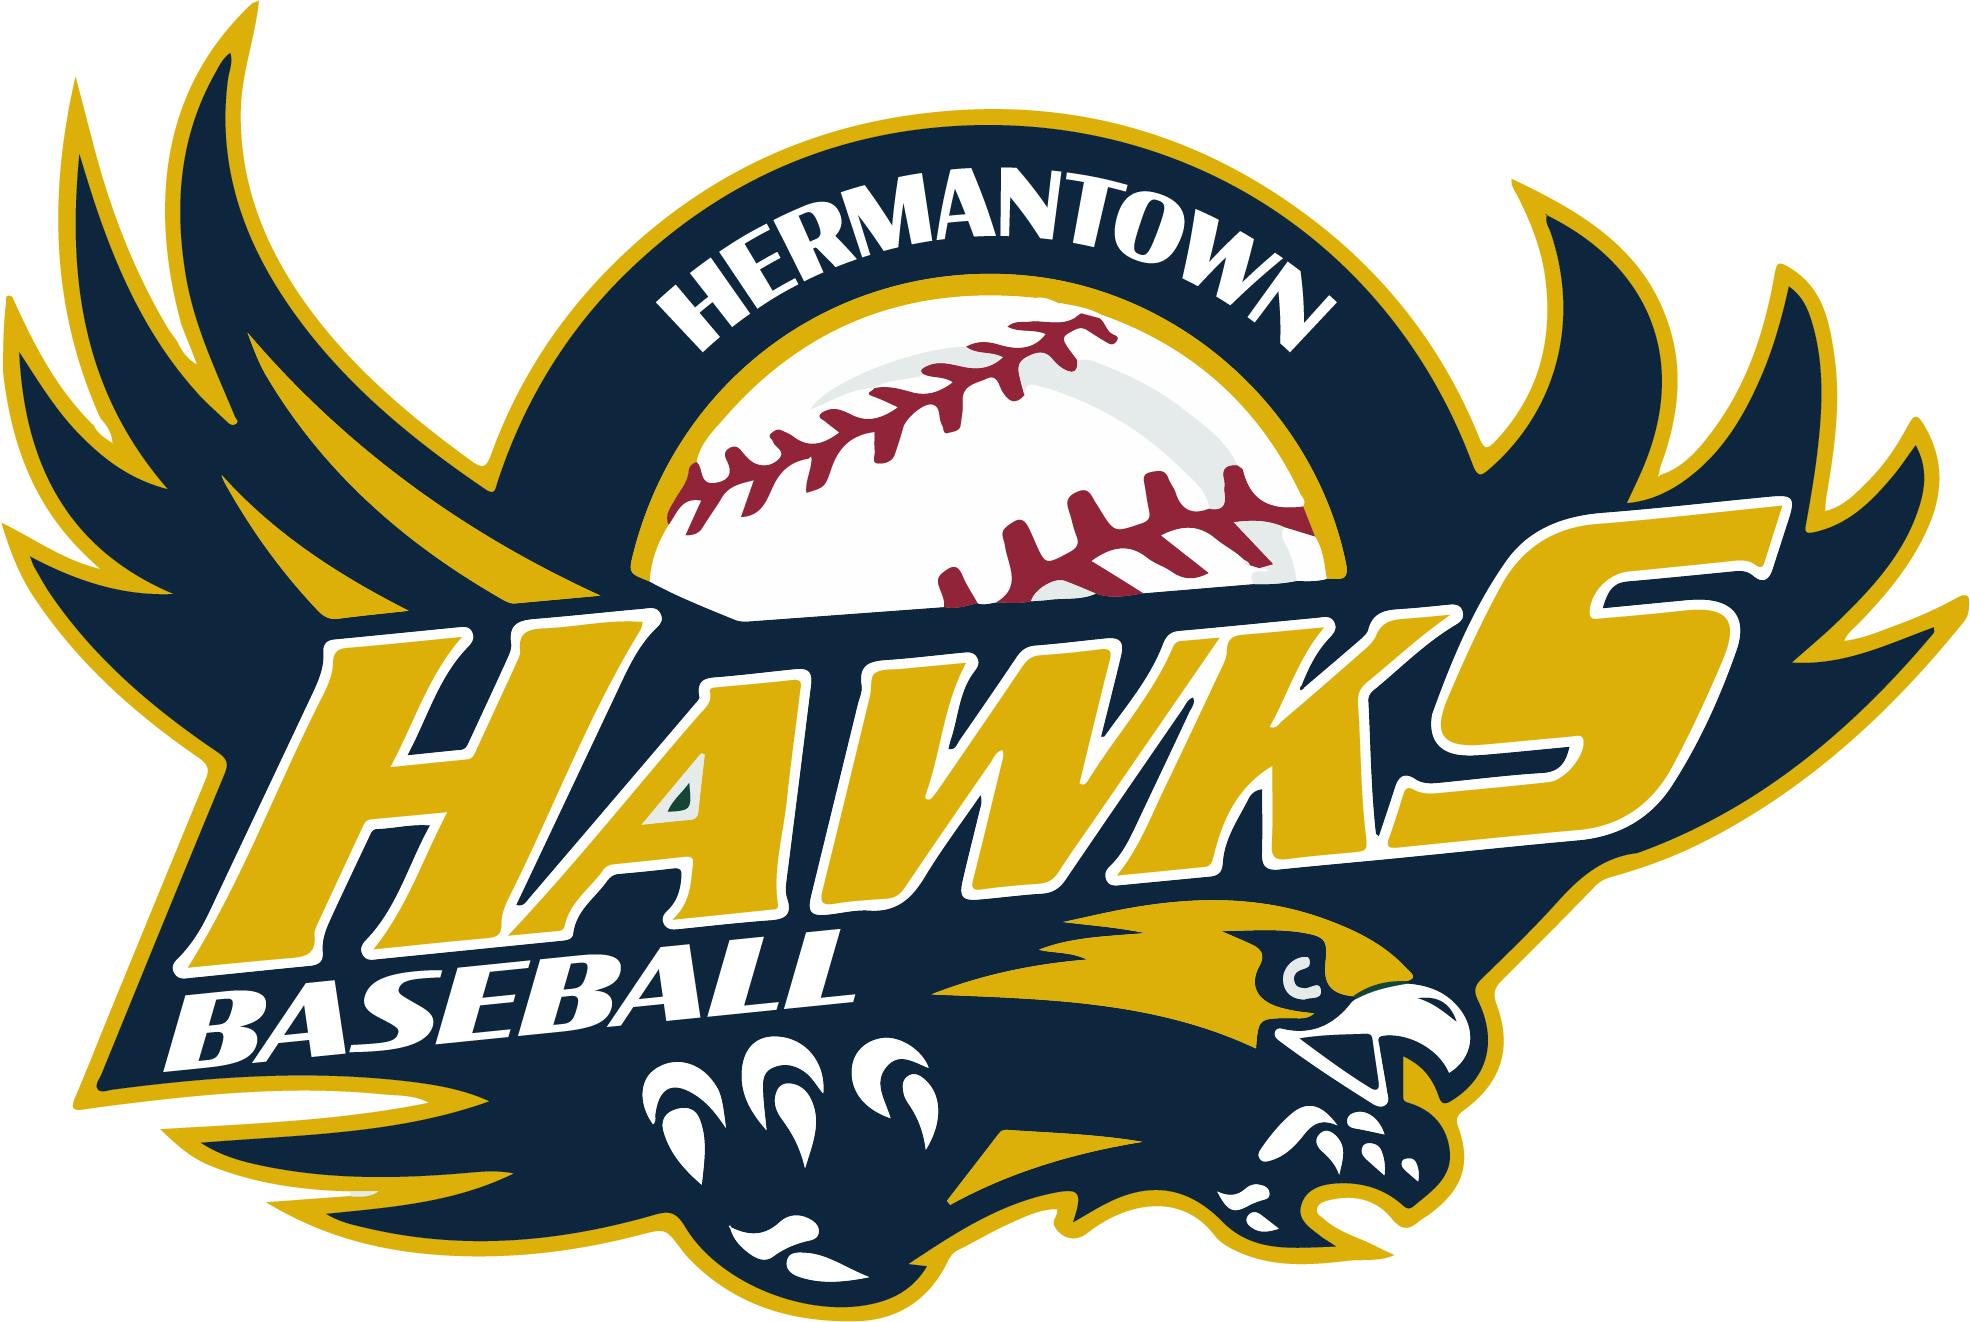 New hermantown baseball logo